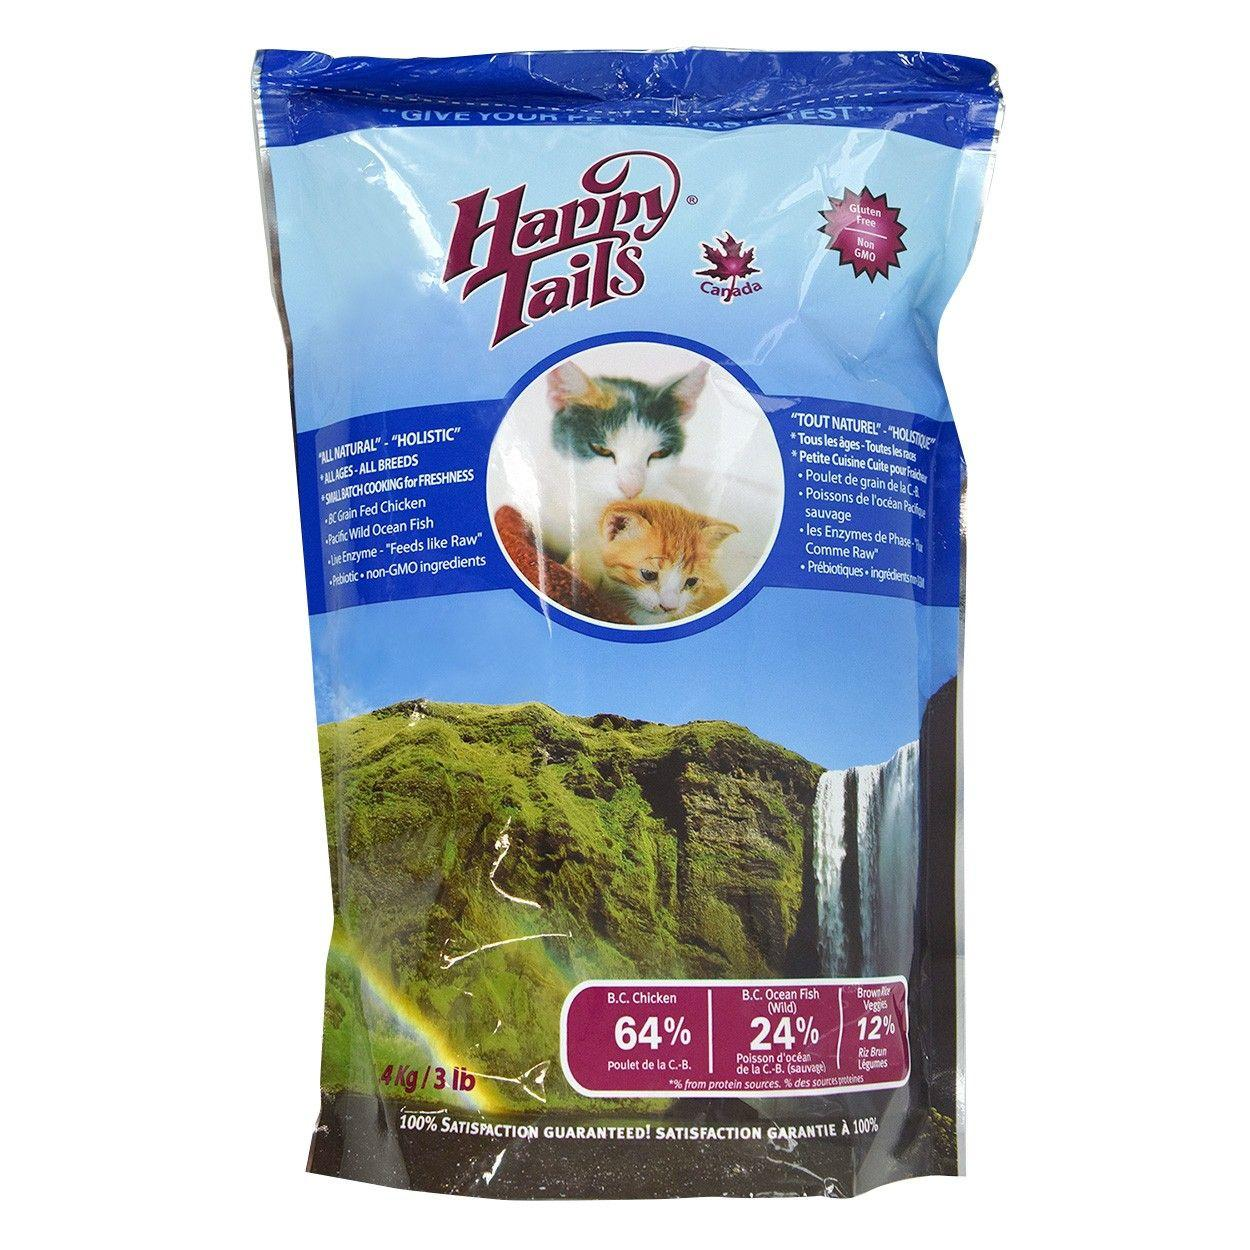 Happy Tails Holistic Dry Cat Food, 3-lb